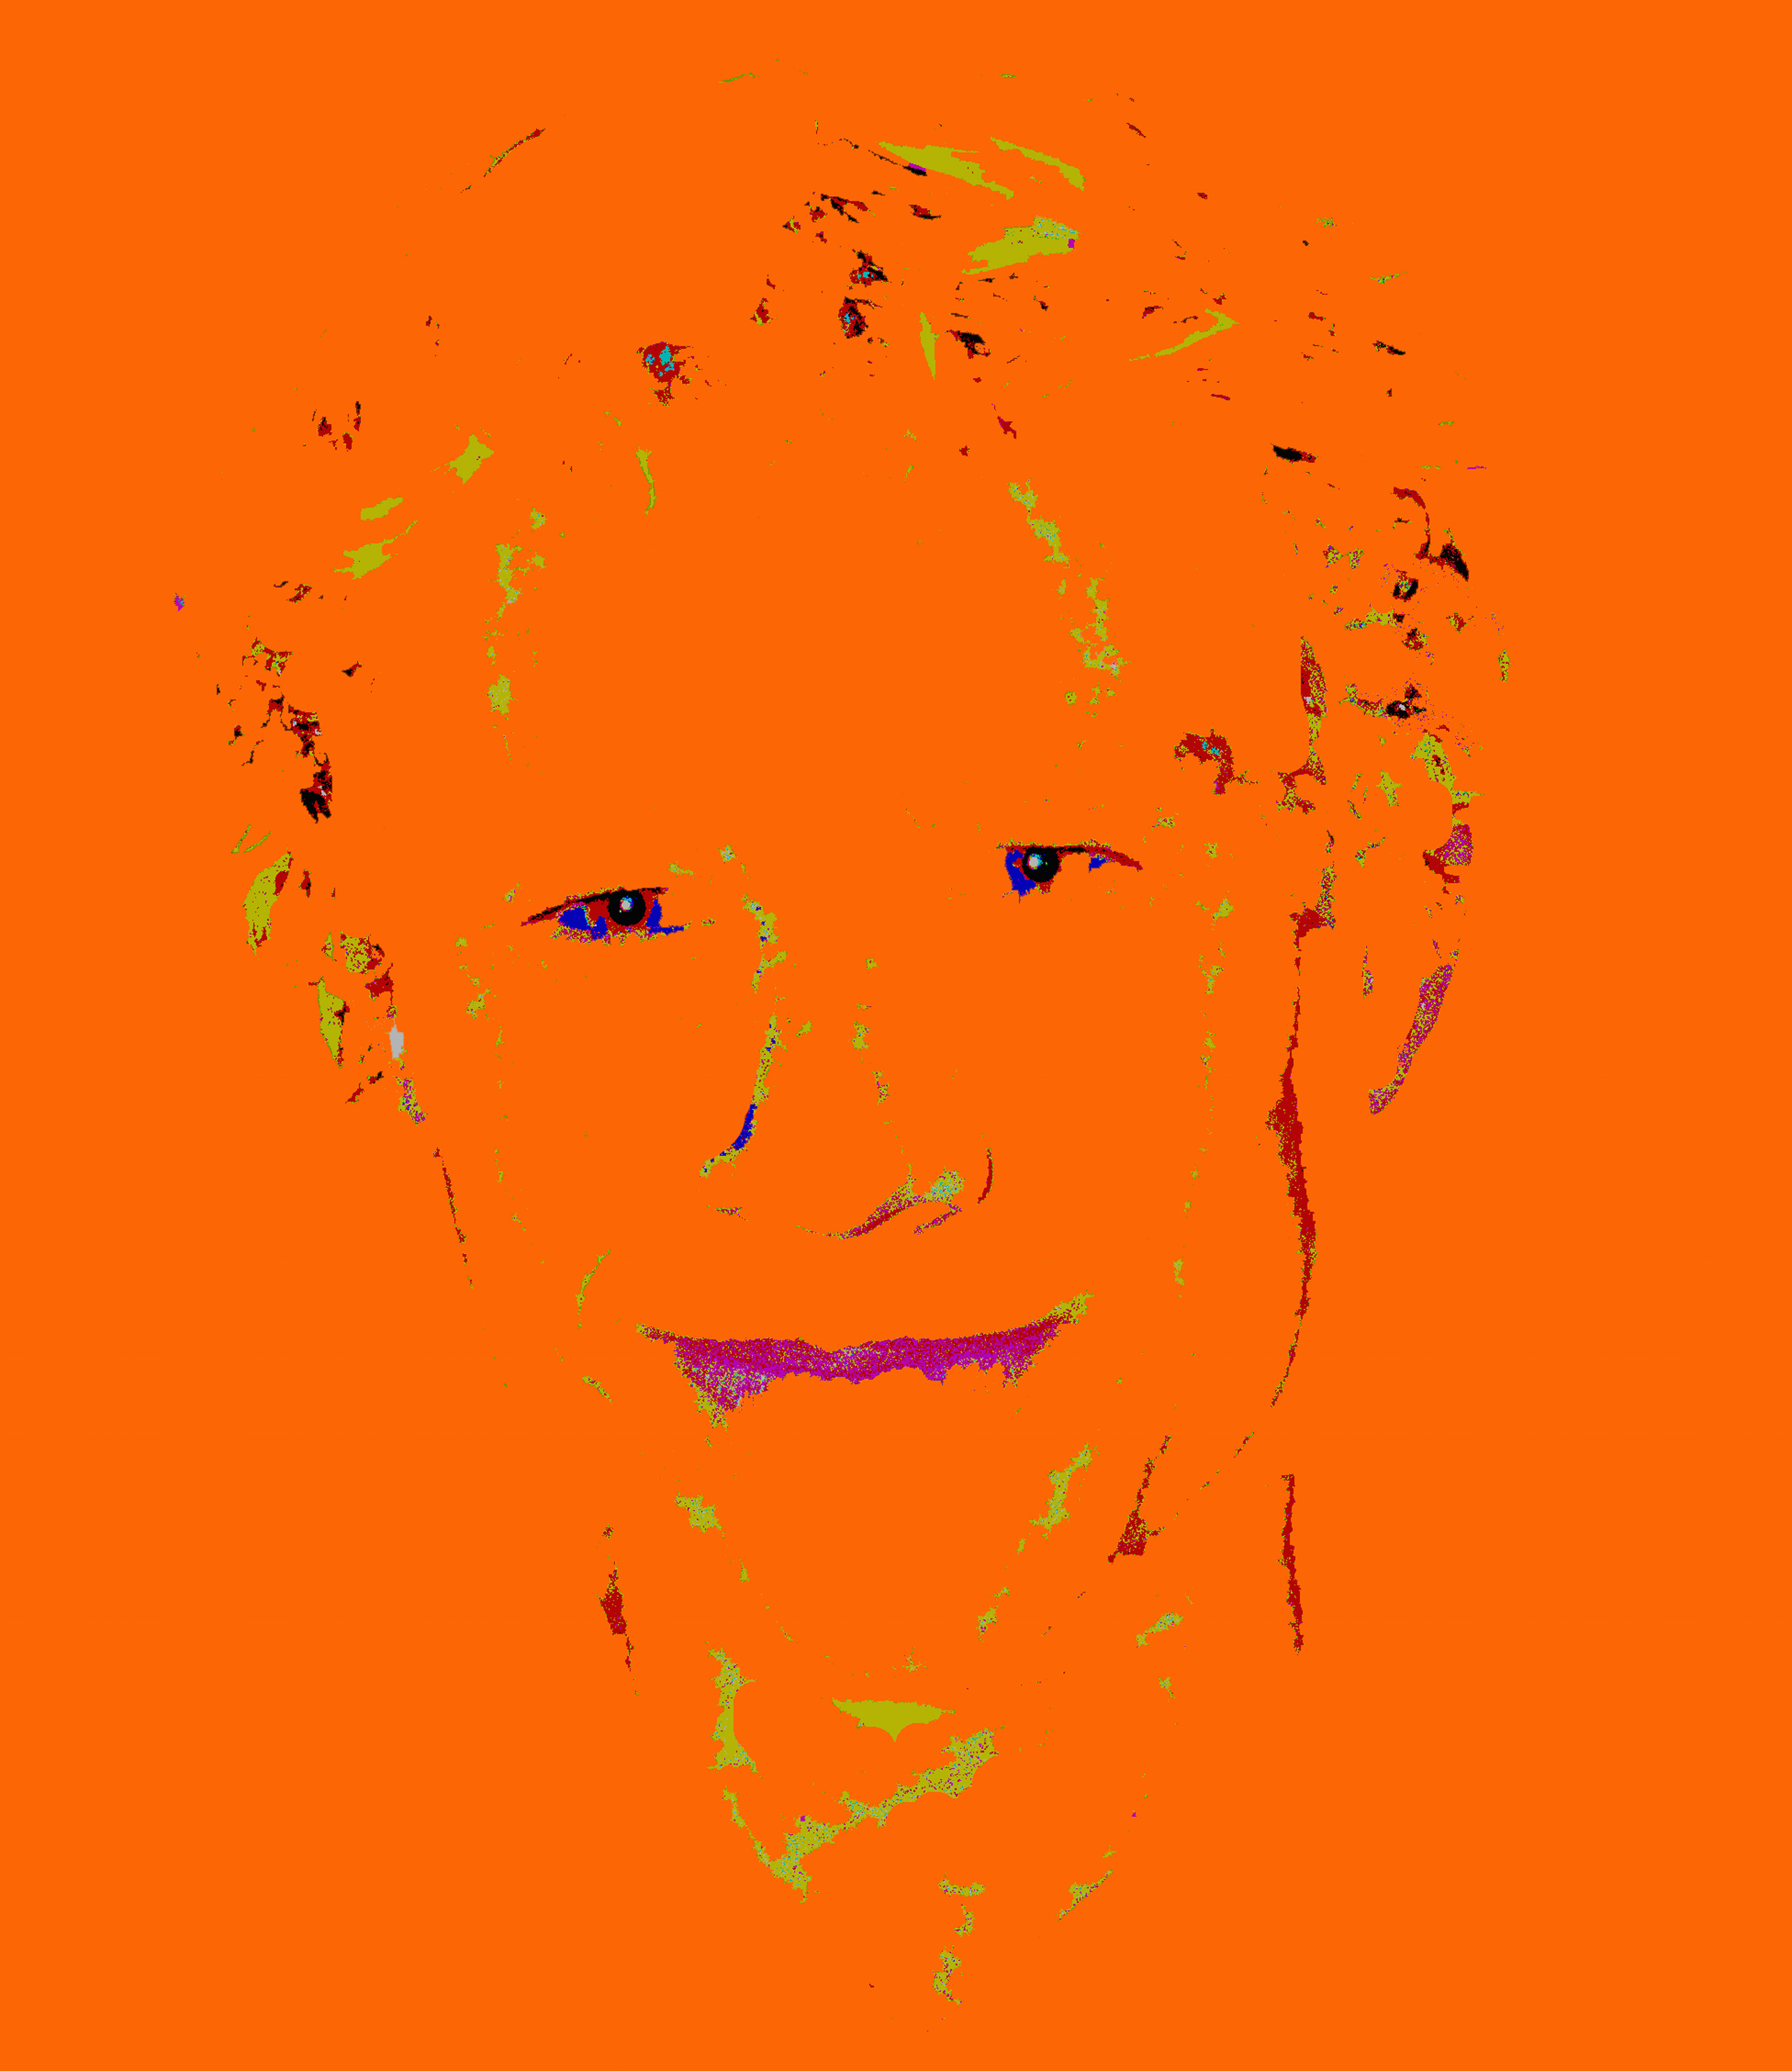 Heath Ledger  artwork by Richard Simpkin - art listed for sale on Artplode